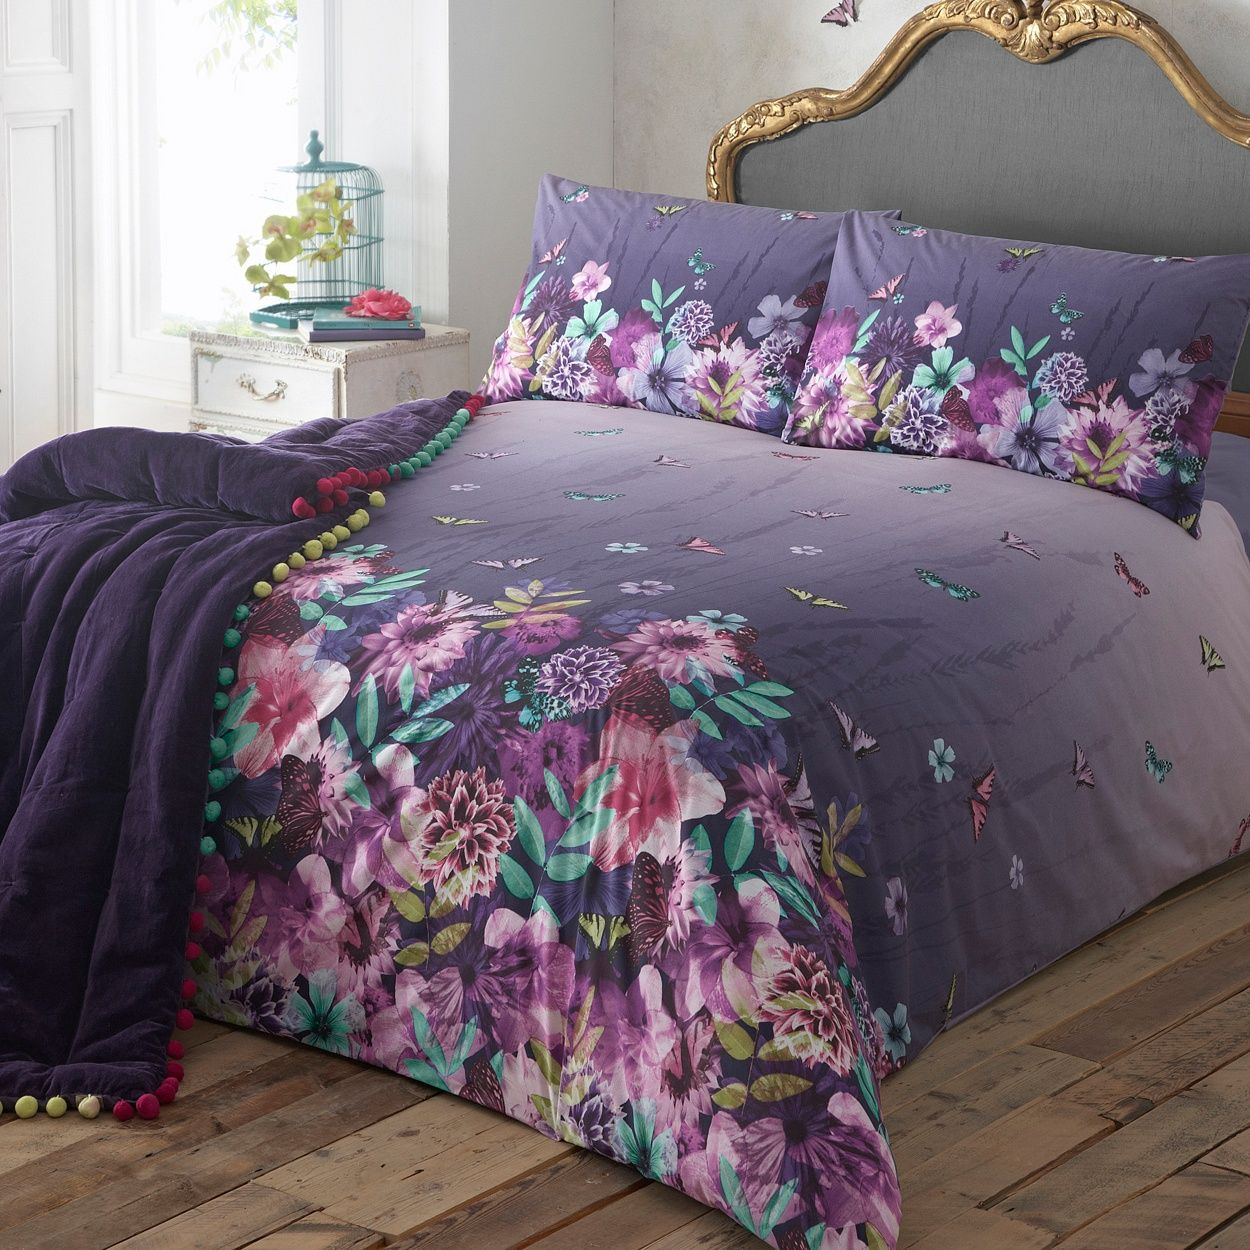 Beau Butterfly Home By Matthew Williamson Designer Purple Butterfly Garden  Bedding Set  At Debenhams.com